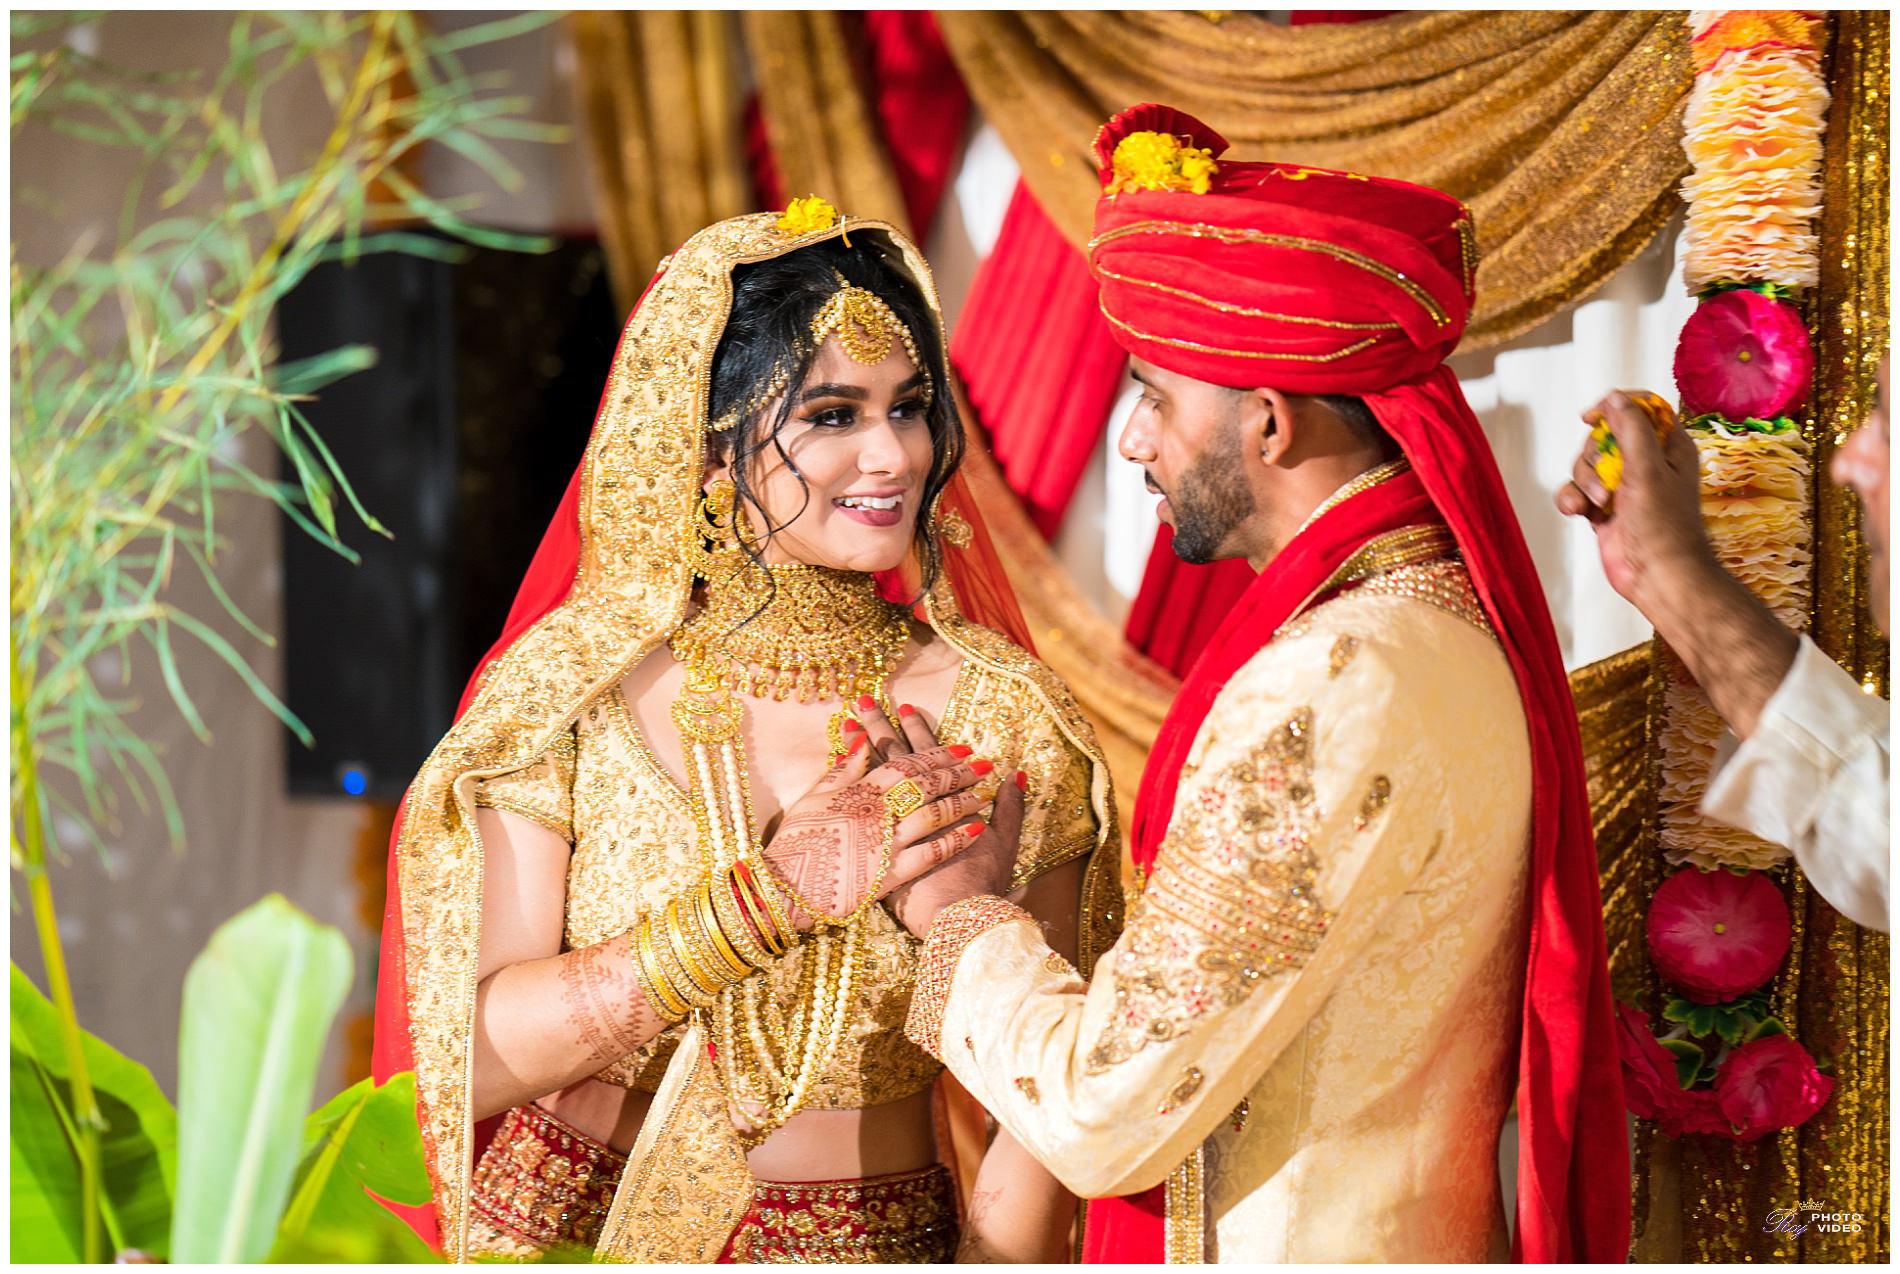 Woodhaven Manor Woodhaven Ny Hindu Wedding Veann Mario